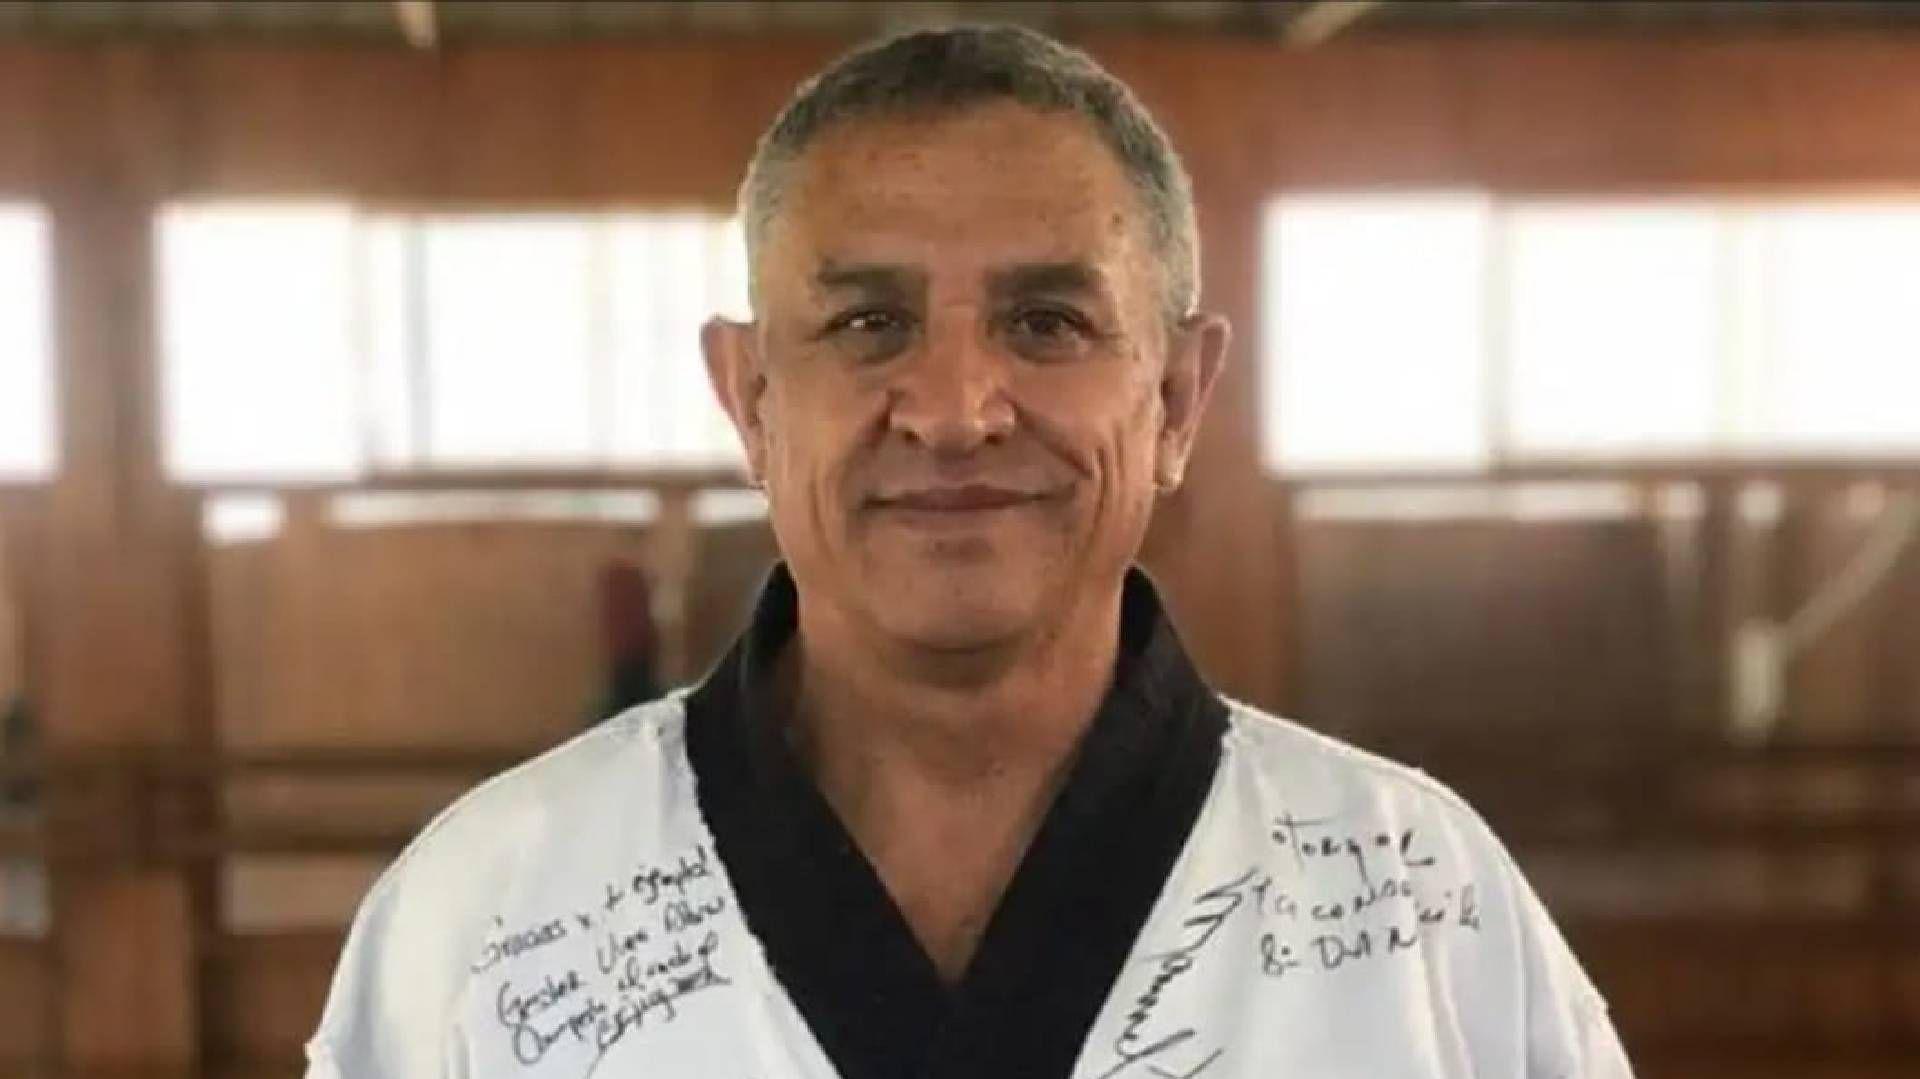 Reinaldo Salazar, entrenador de taekwondo y padre de los medallistas olímpicos, Óscar e Iridia (Foto: Twitter@CONADE)